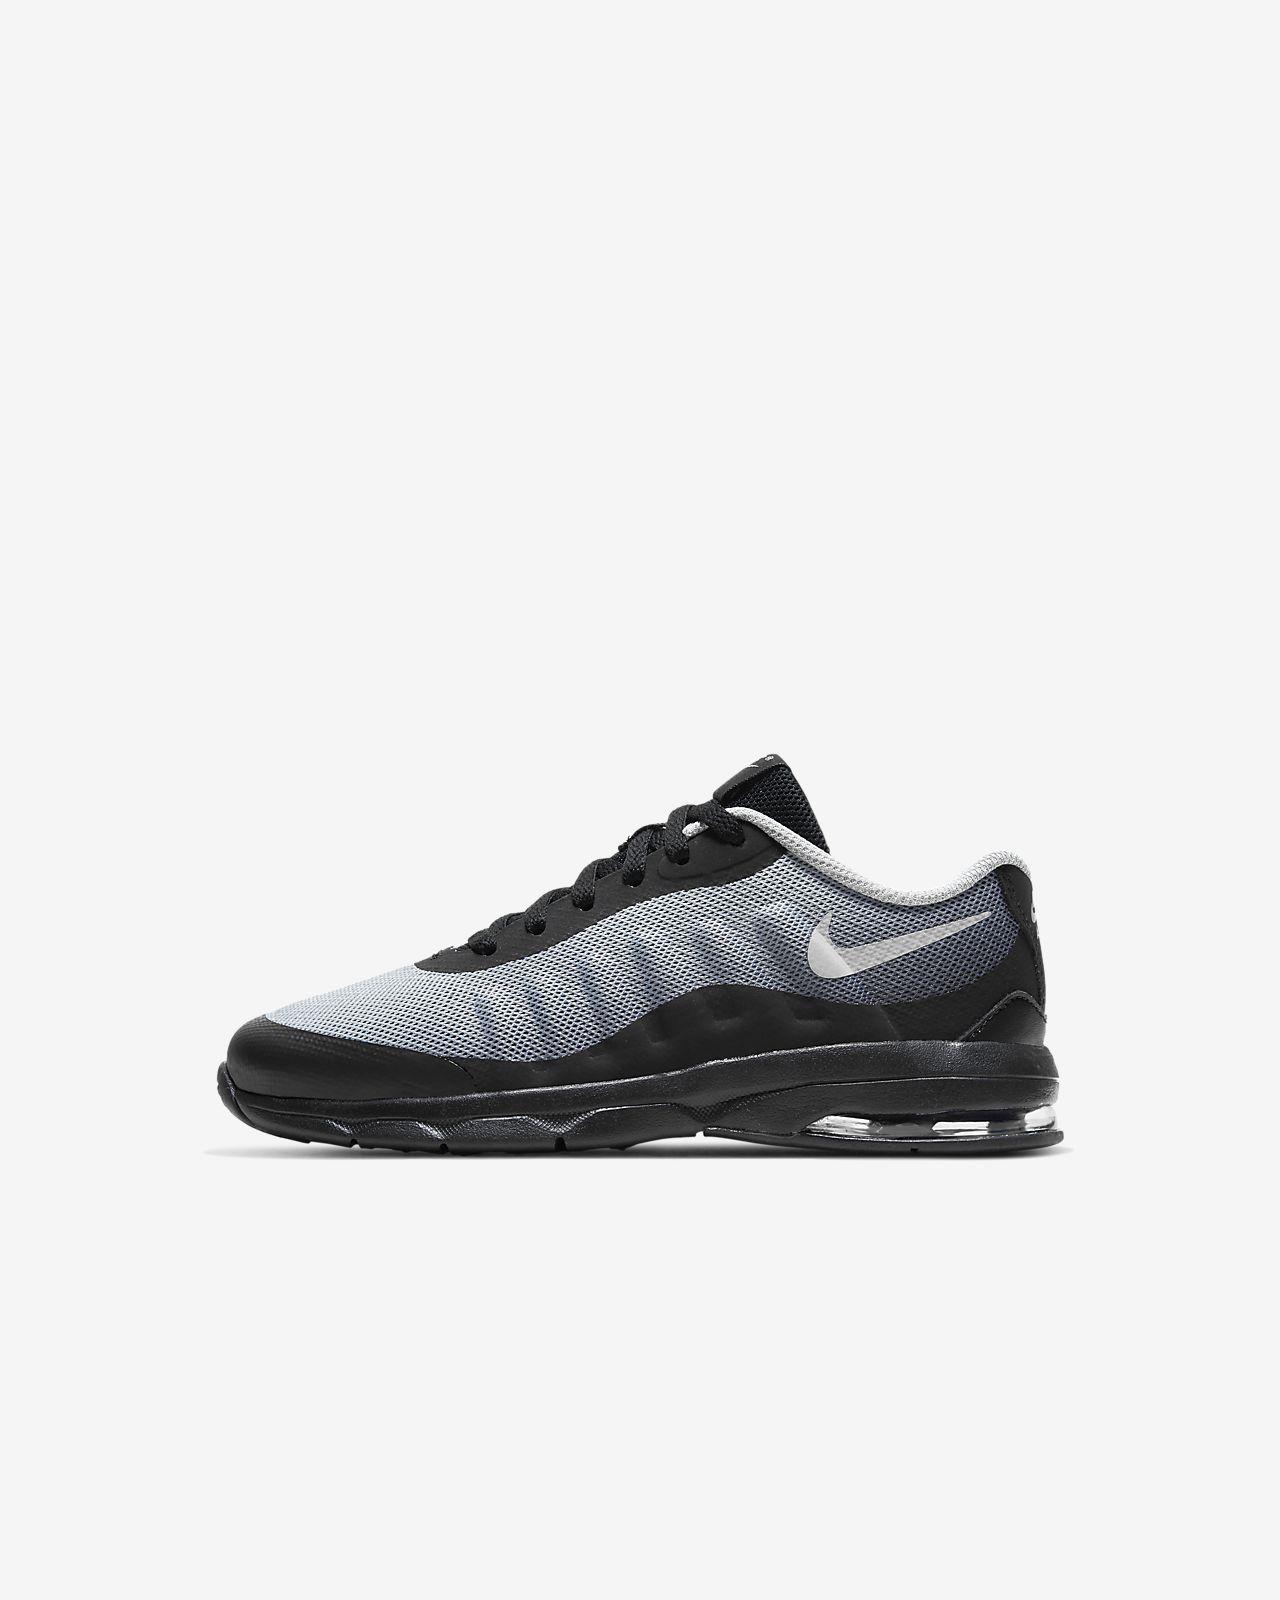 Nike Air Max Invigor Schuh für jüngere Kinder